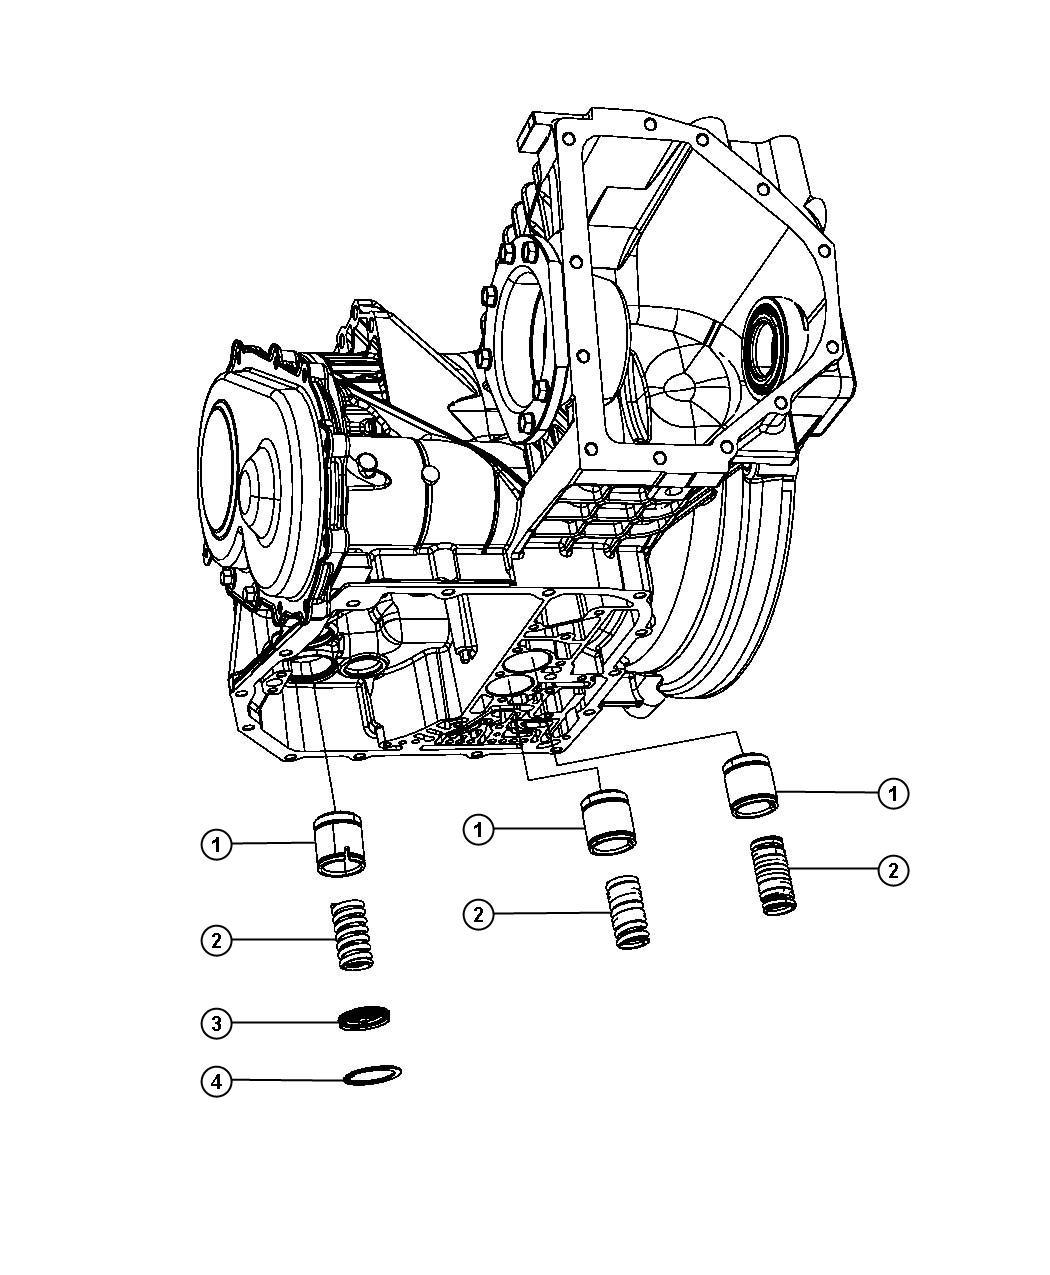 Chrysler 200 Cover. Accumulator. [european commercial prep